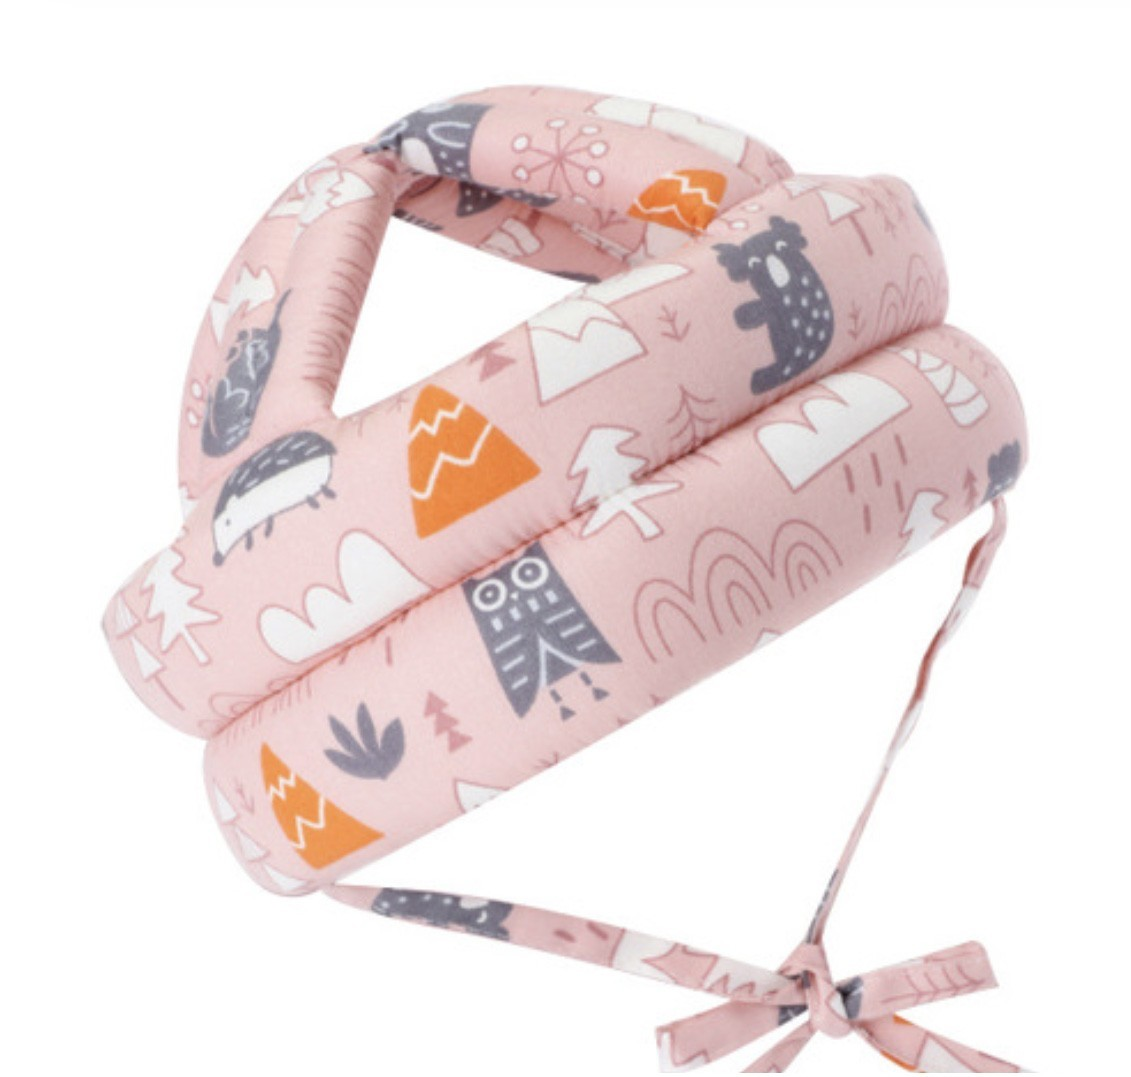 Casca protectie copii 6-36 luni, bumbac plus spuma, ajustabila, 65grame, roz imagine techstar.ro 2021